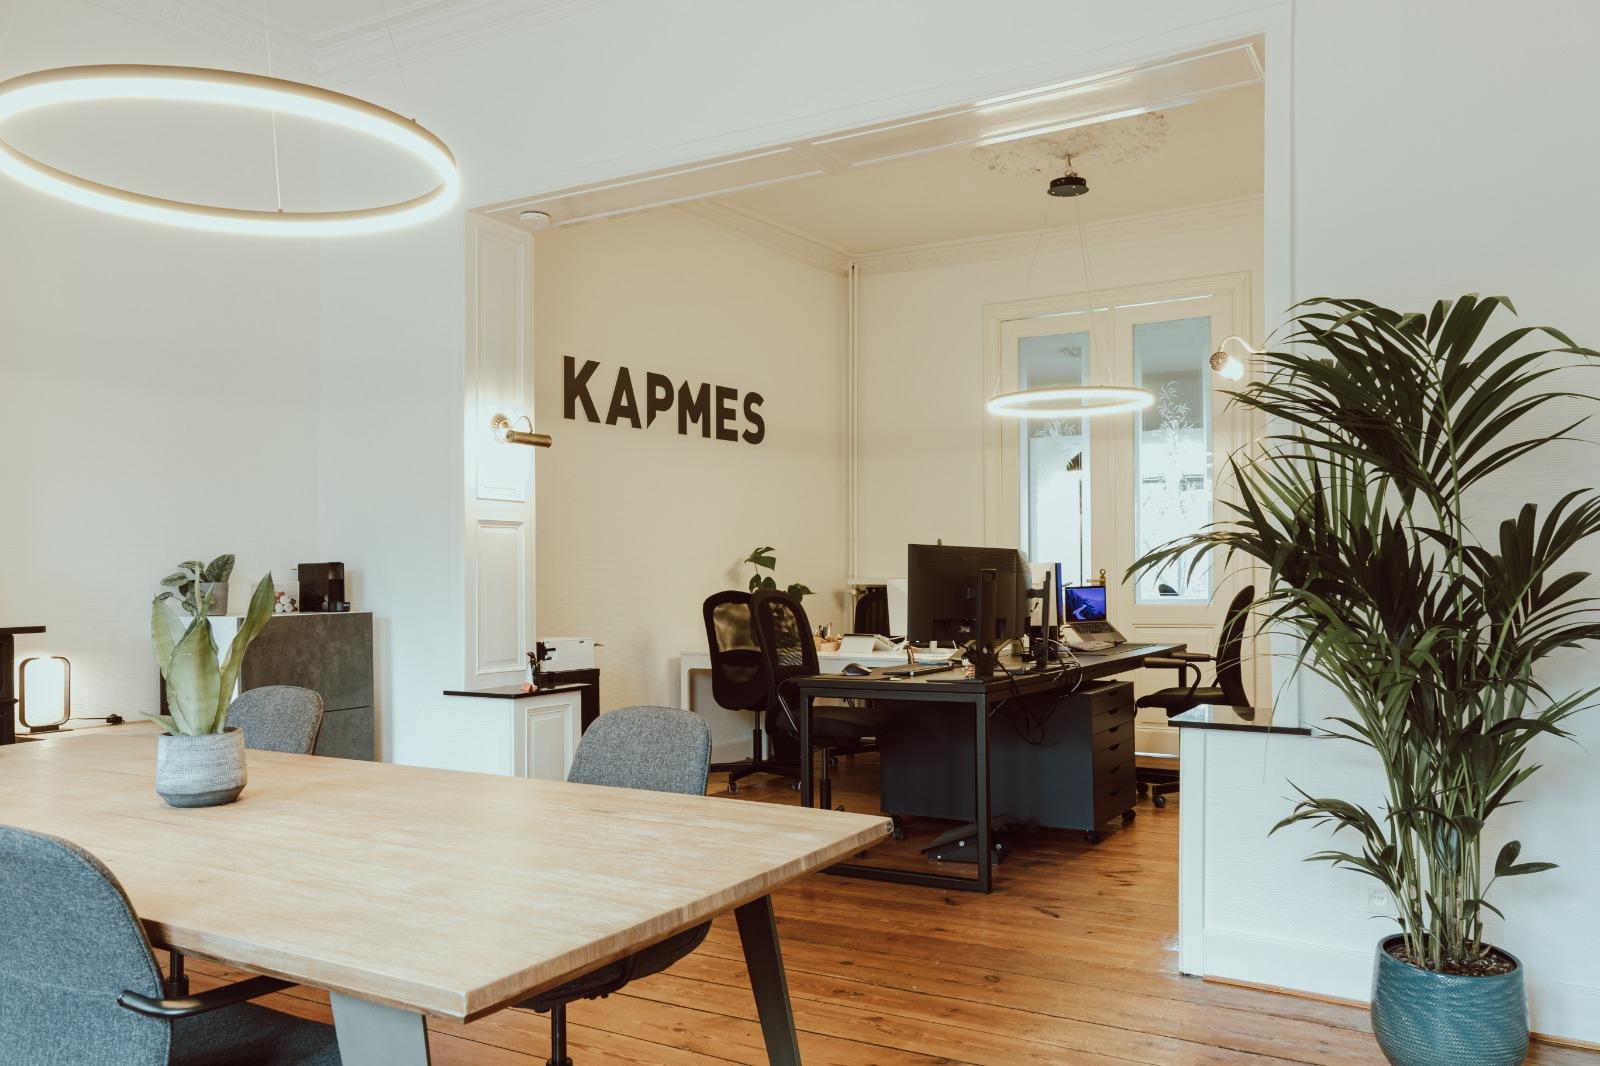 KAPMES branding bureau cover